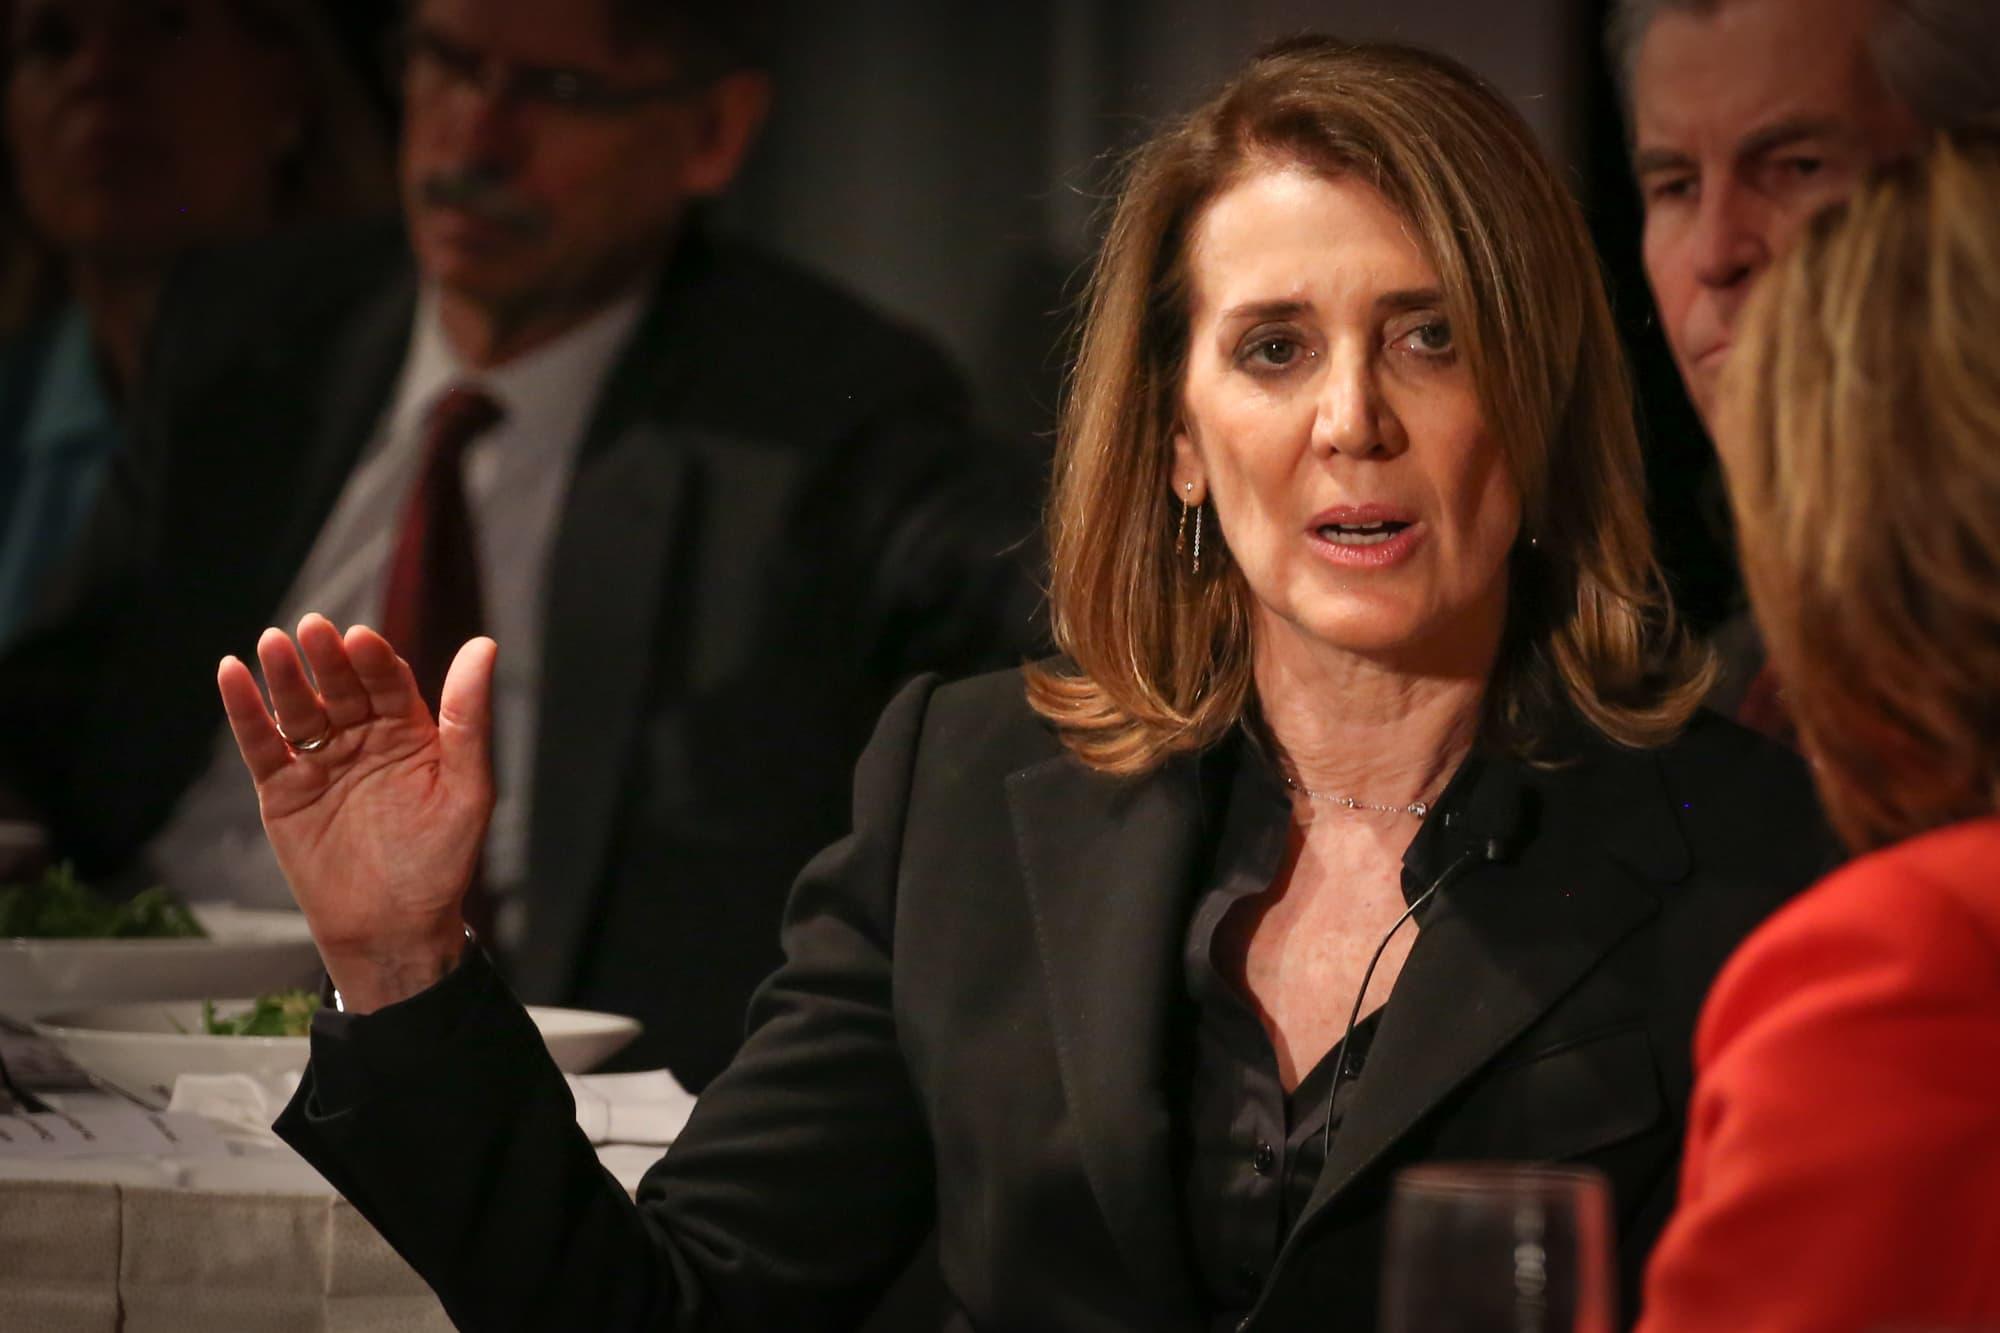 Alphabet CFO Ruth Porat: Wall Street should have TGIF like